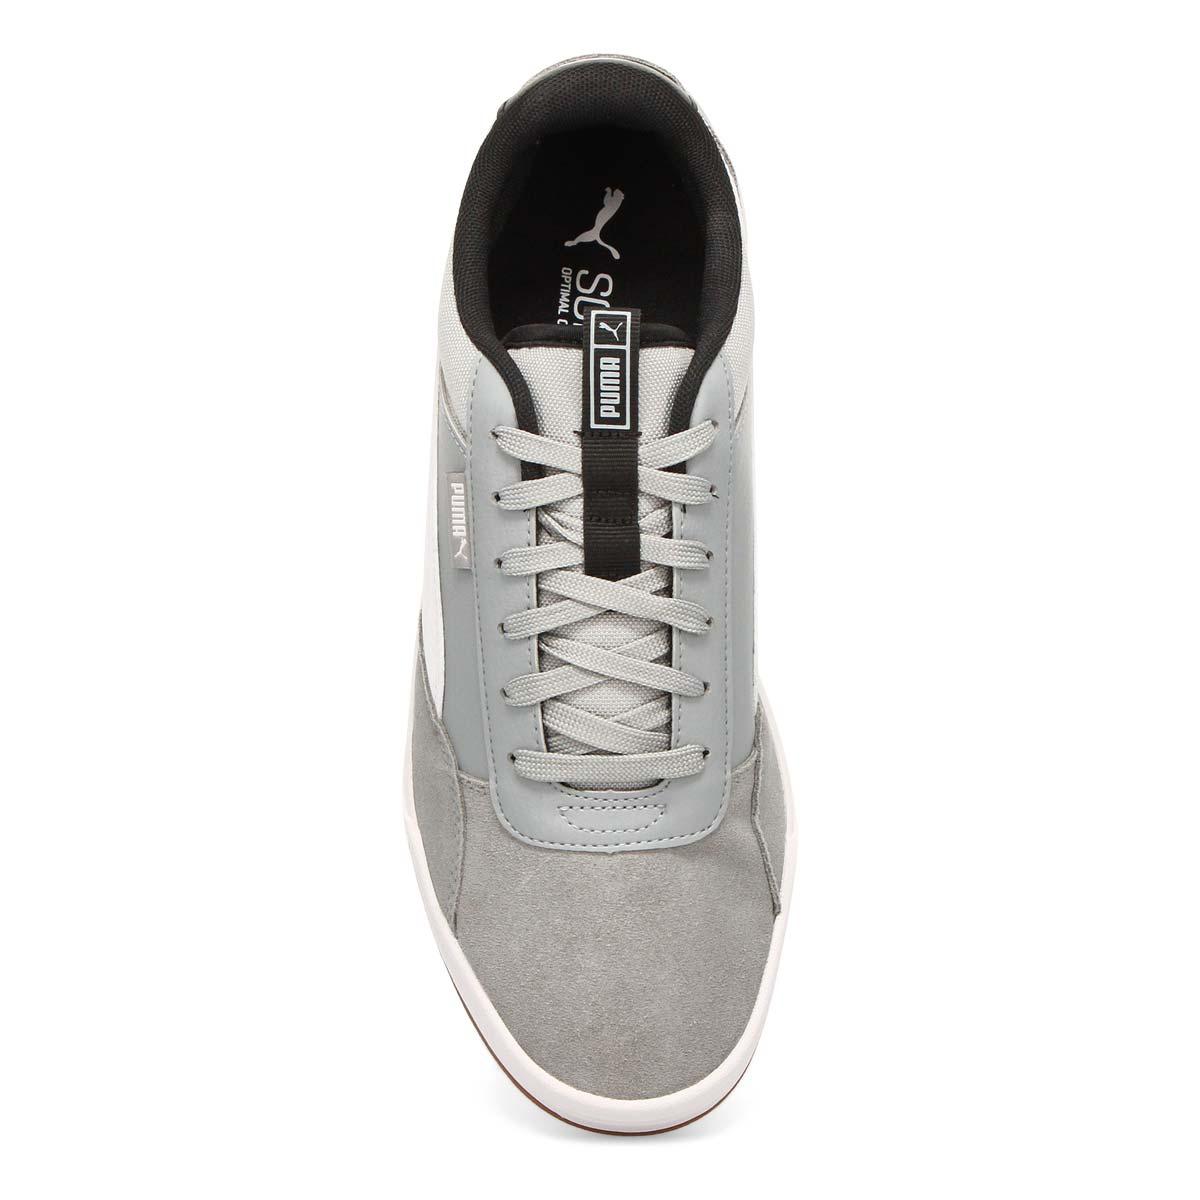 Men's PUMA C-SKATE  quarry wht/blk sneakers